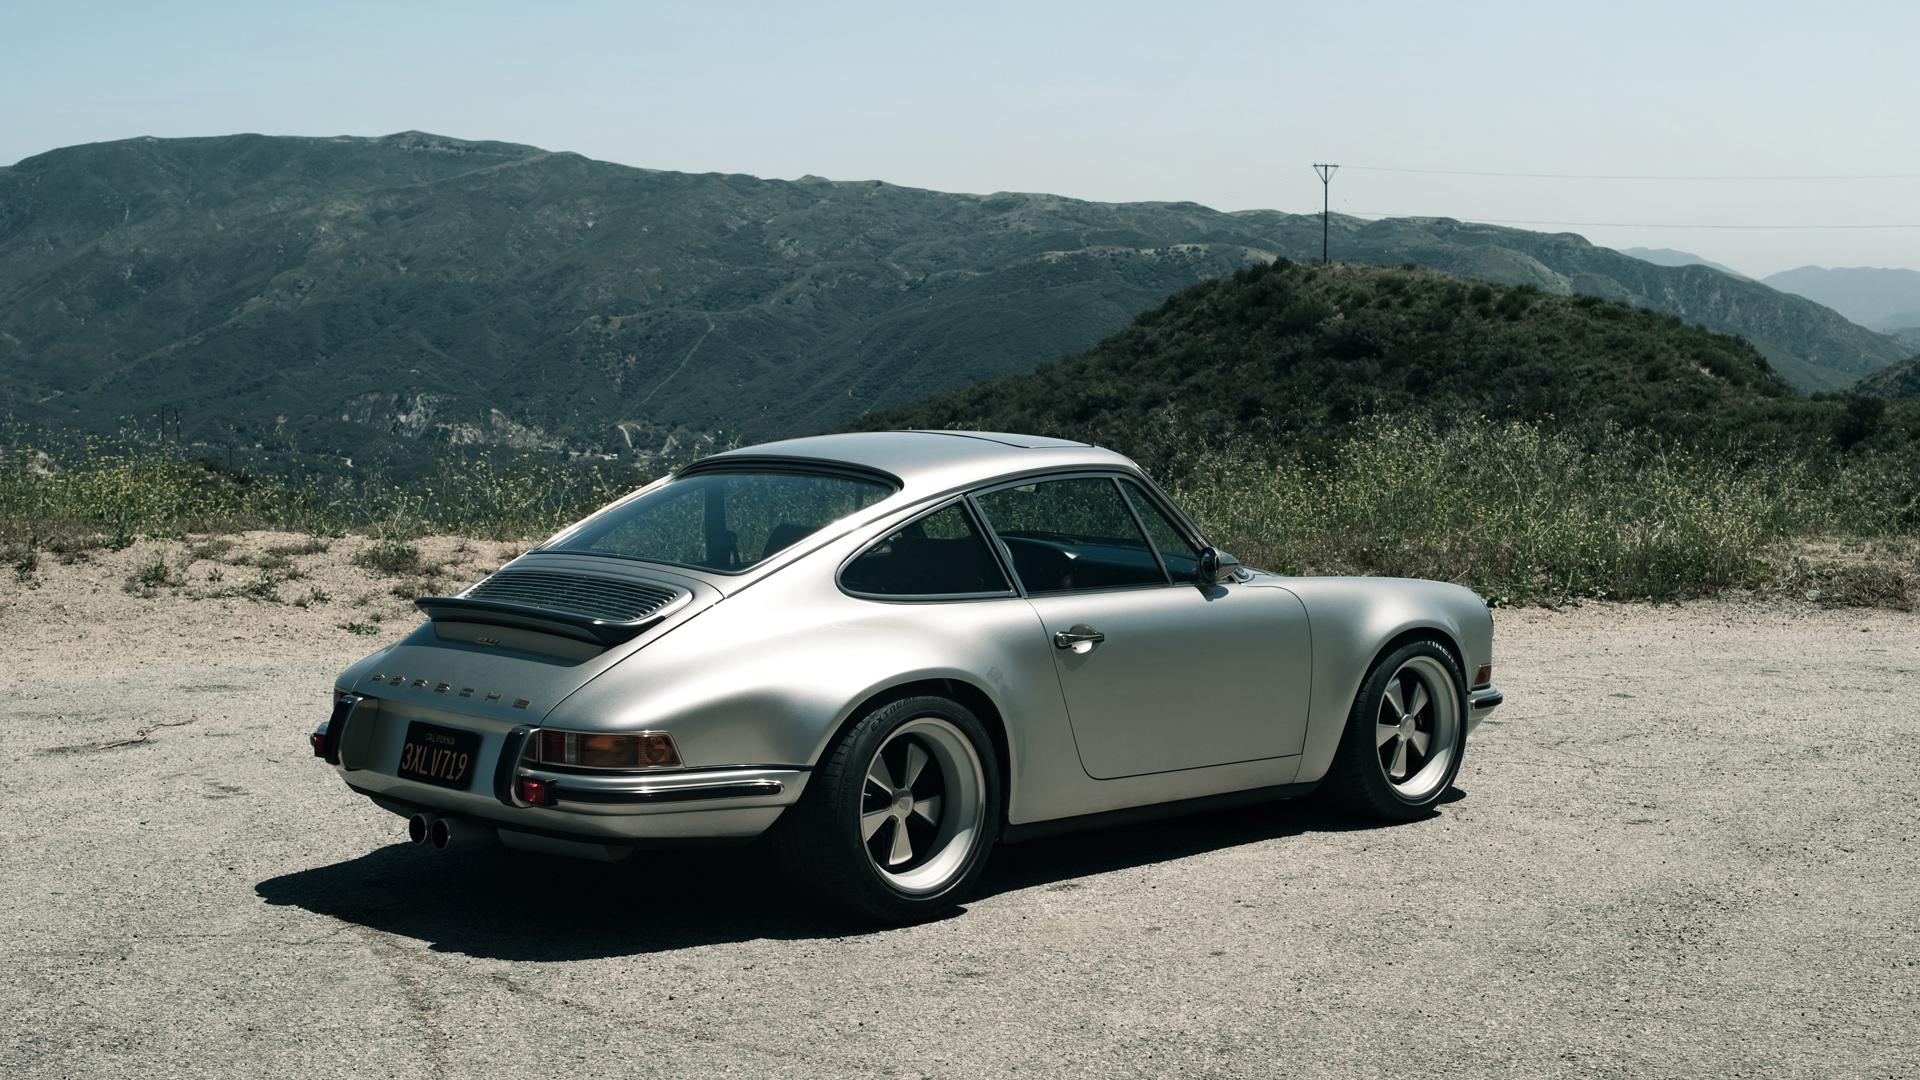 Porsche 911 Classic 2 Wallpaper HD Car Wallpapers 1920x1080